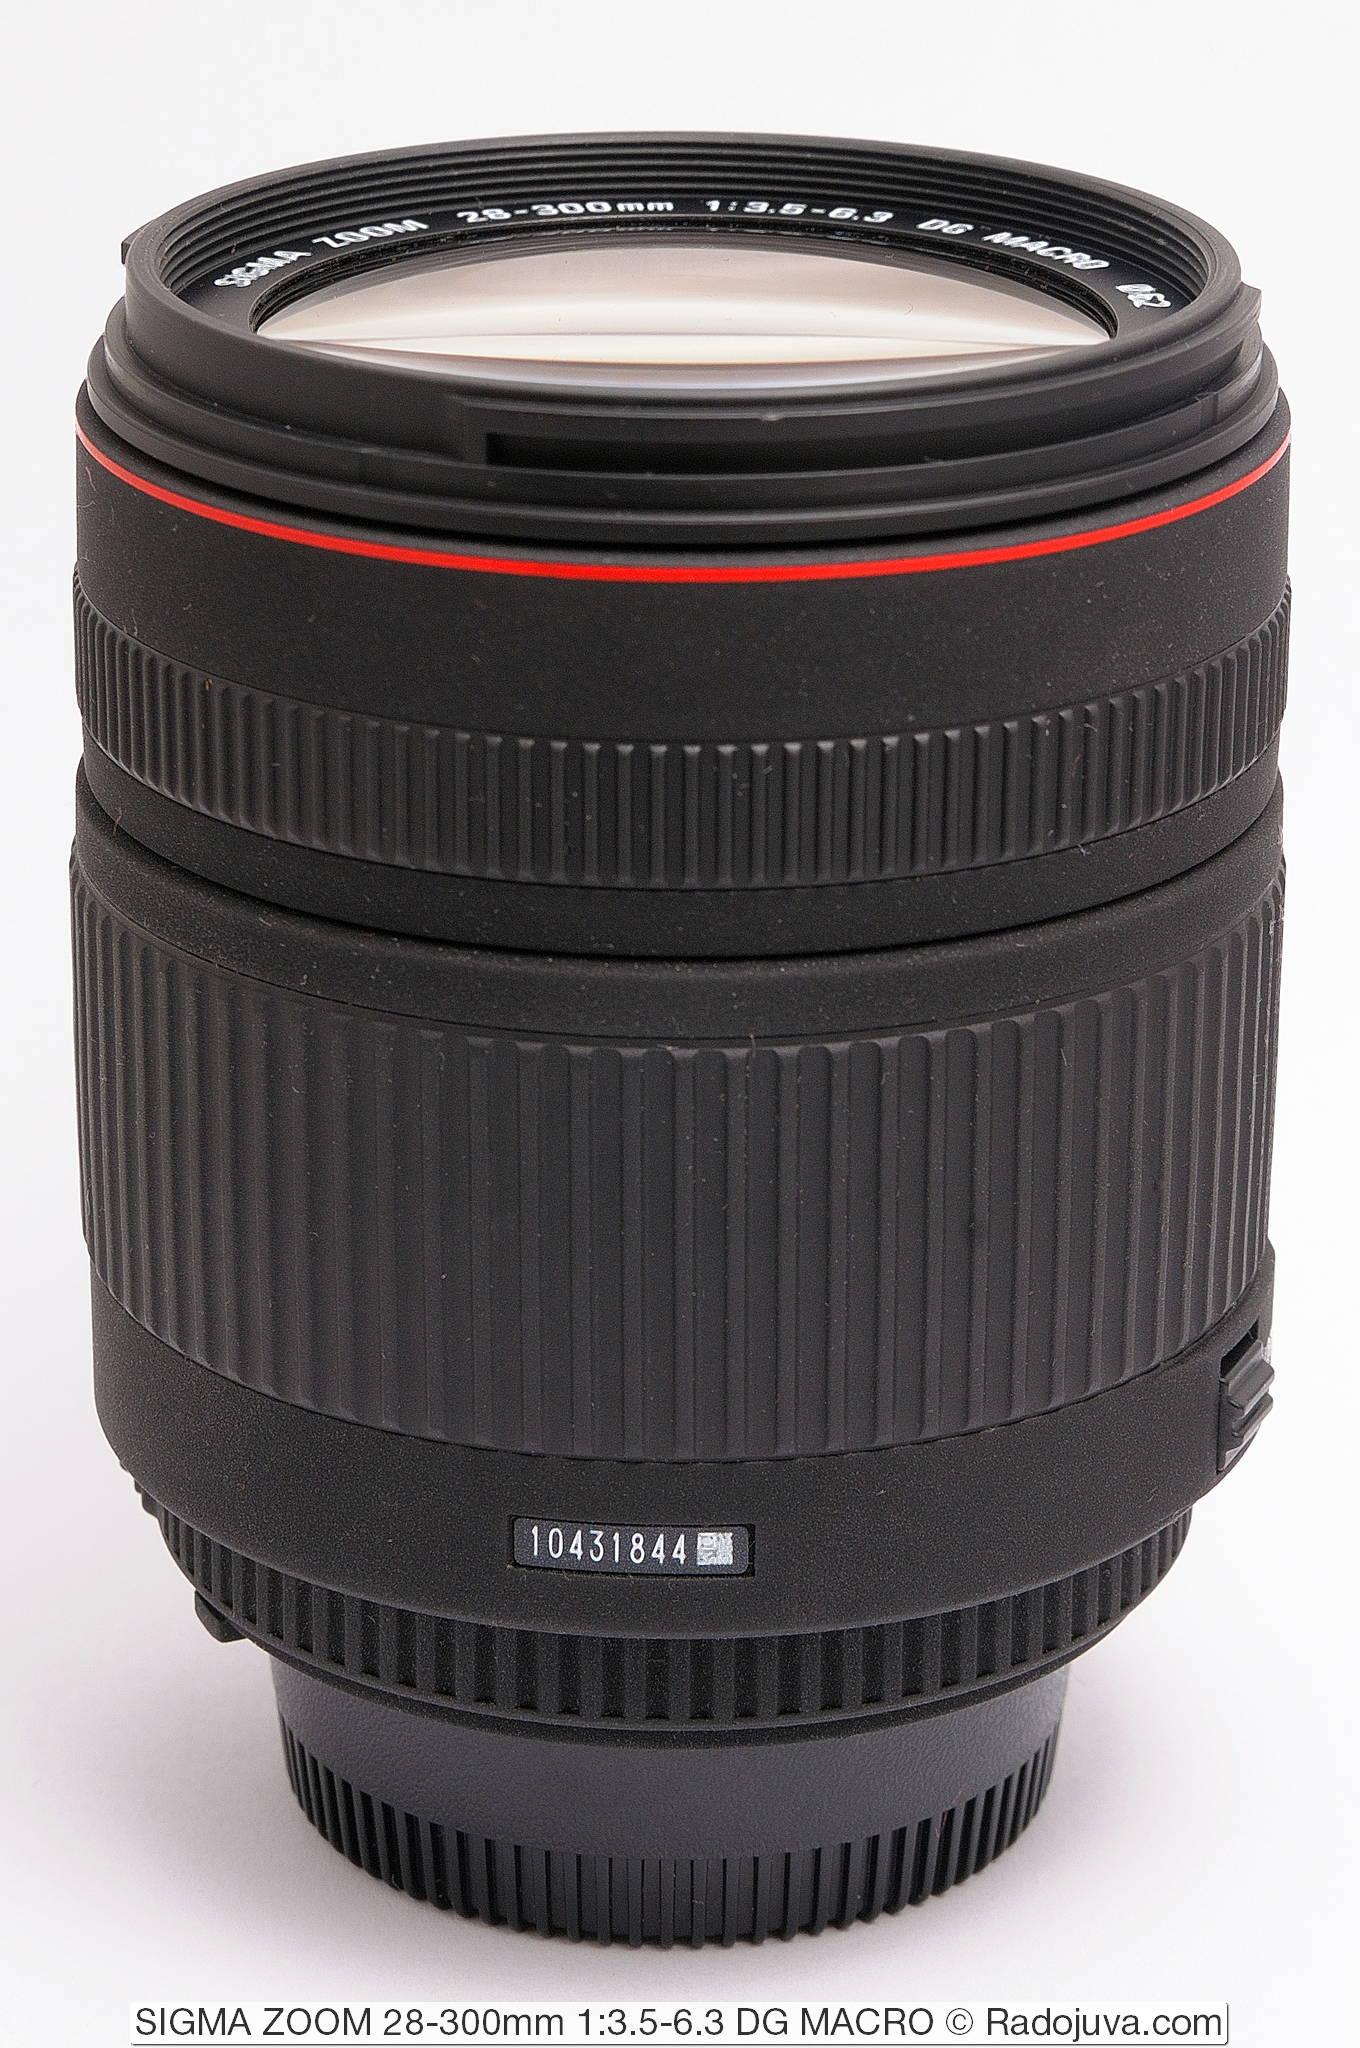 SIGMA ZOOM 28-300mm 1:3.5-6.3 DG MACRO